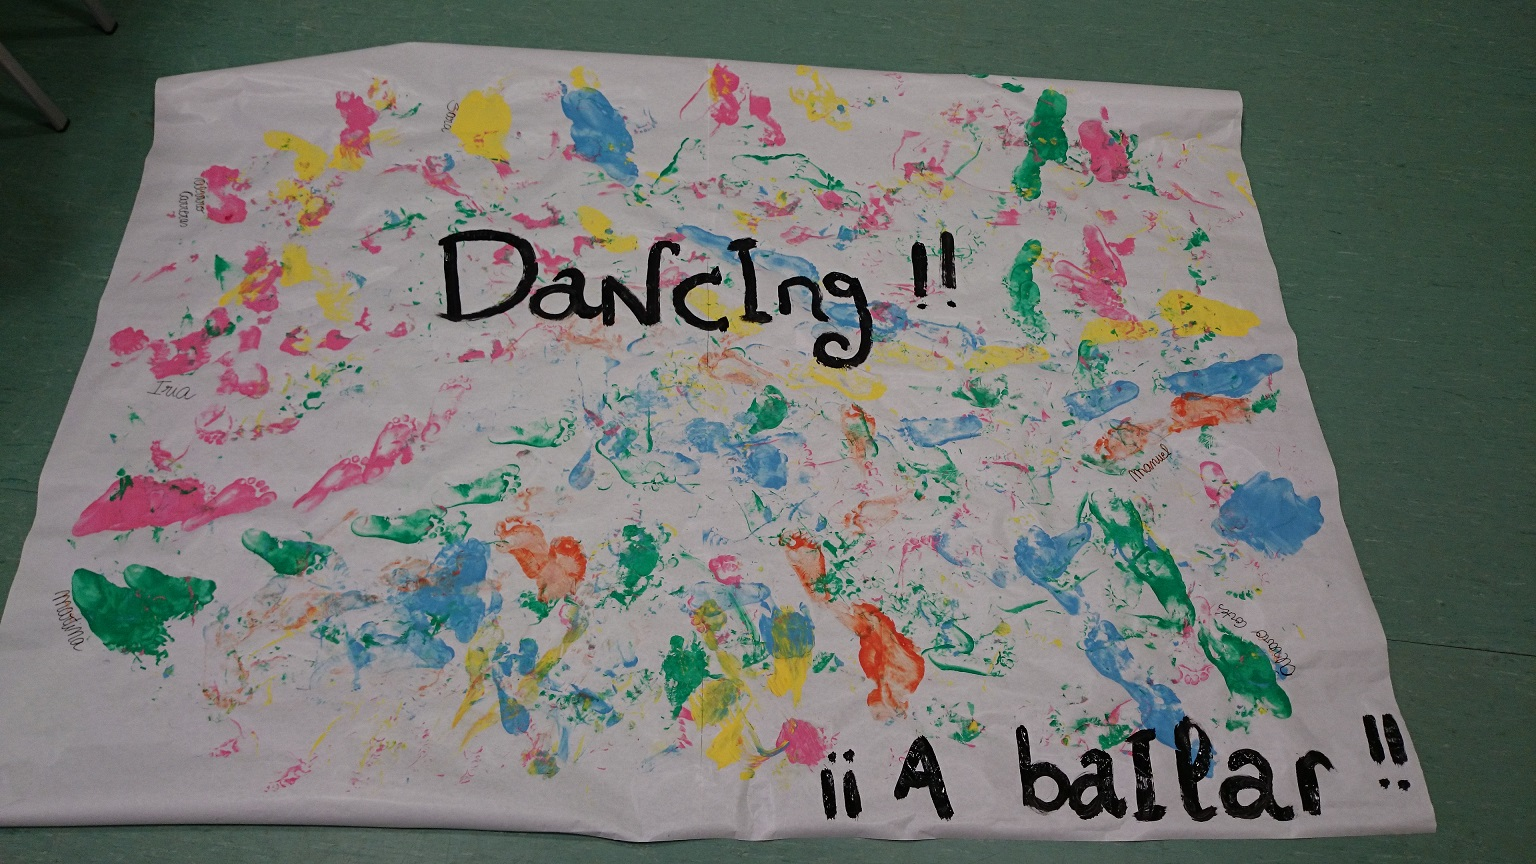 ACTIVITAT: DANCING